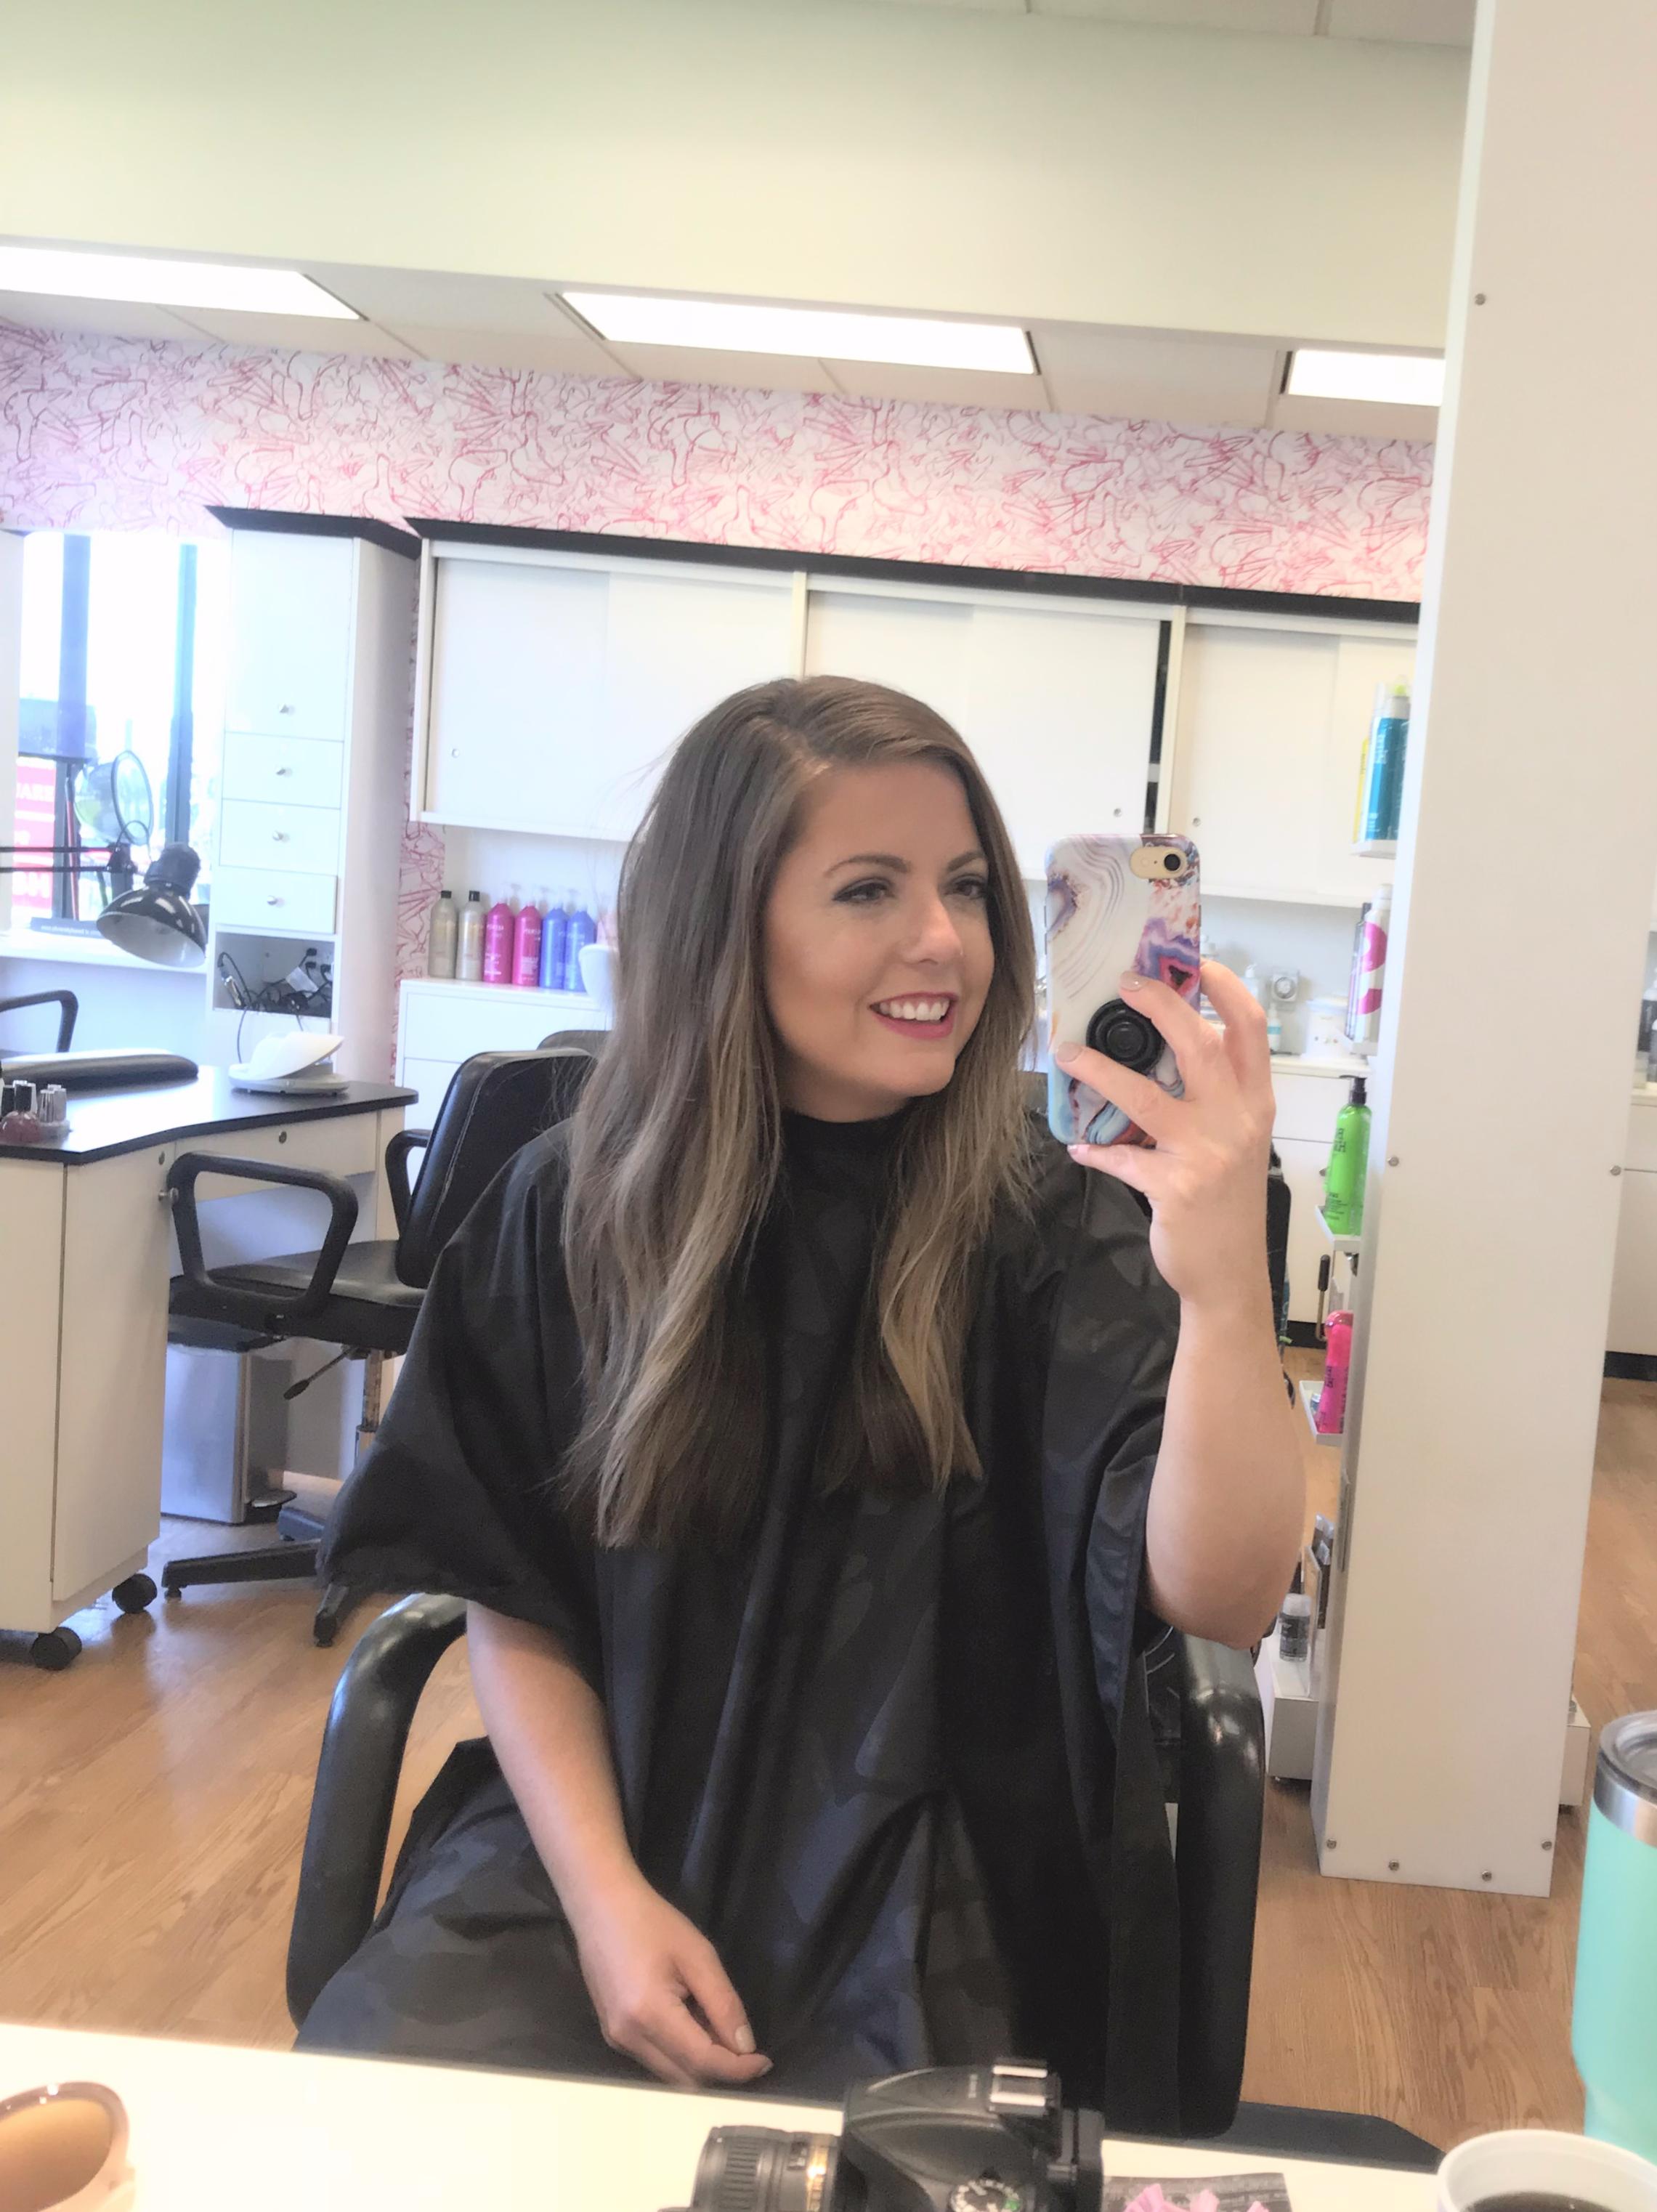 Hair got chopped by Beauty Brands